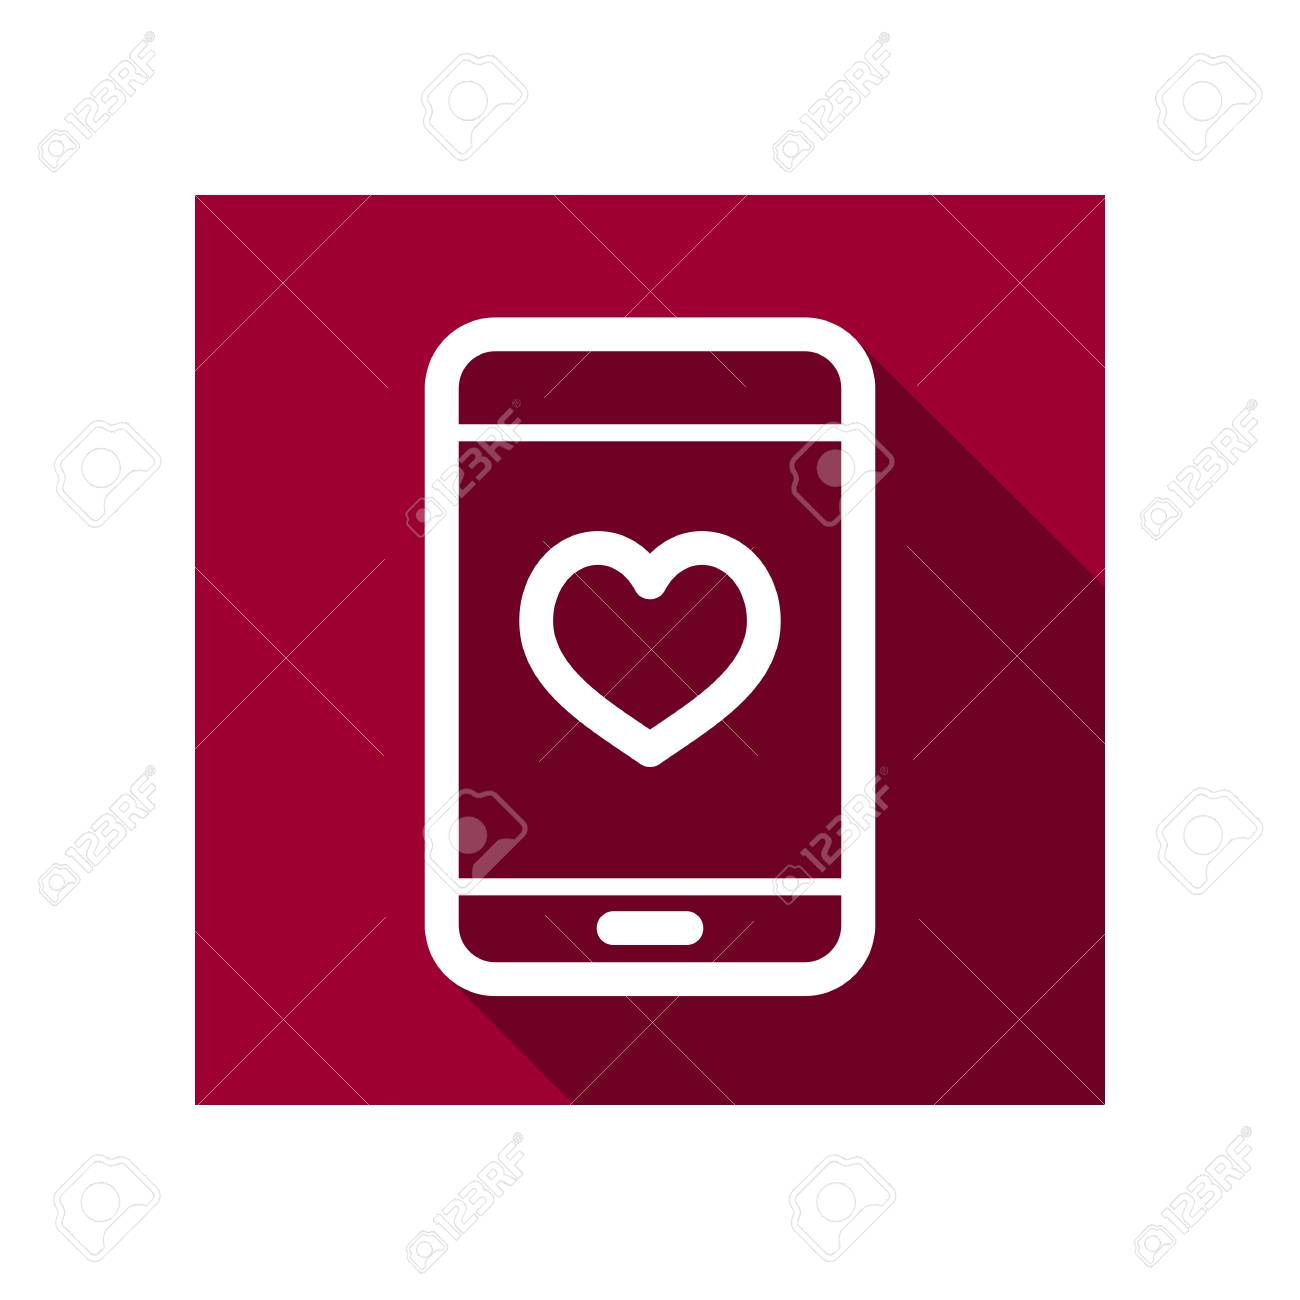 Technology Heart Smartphone Mobile Phone Romantic Telephone Call